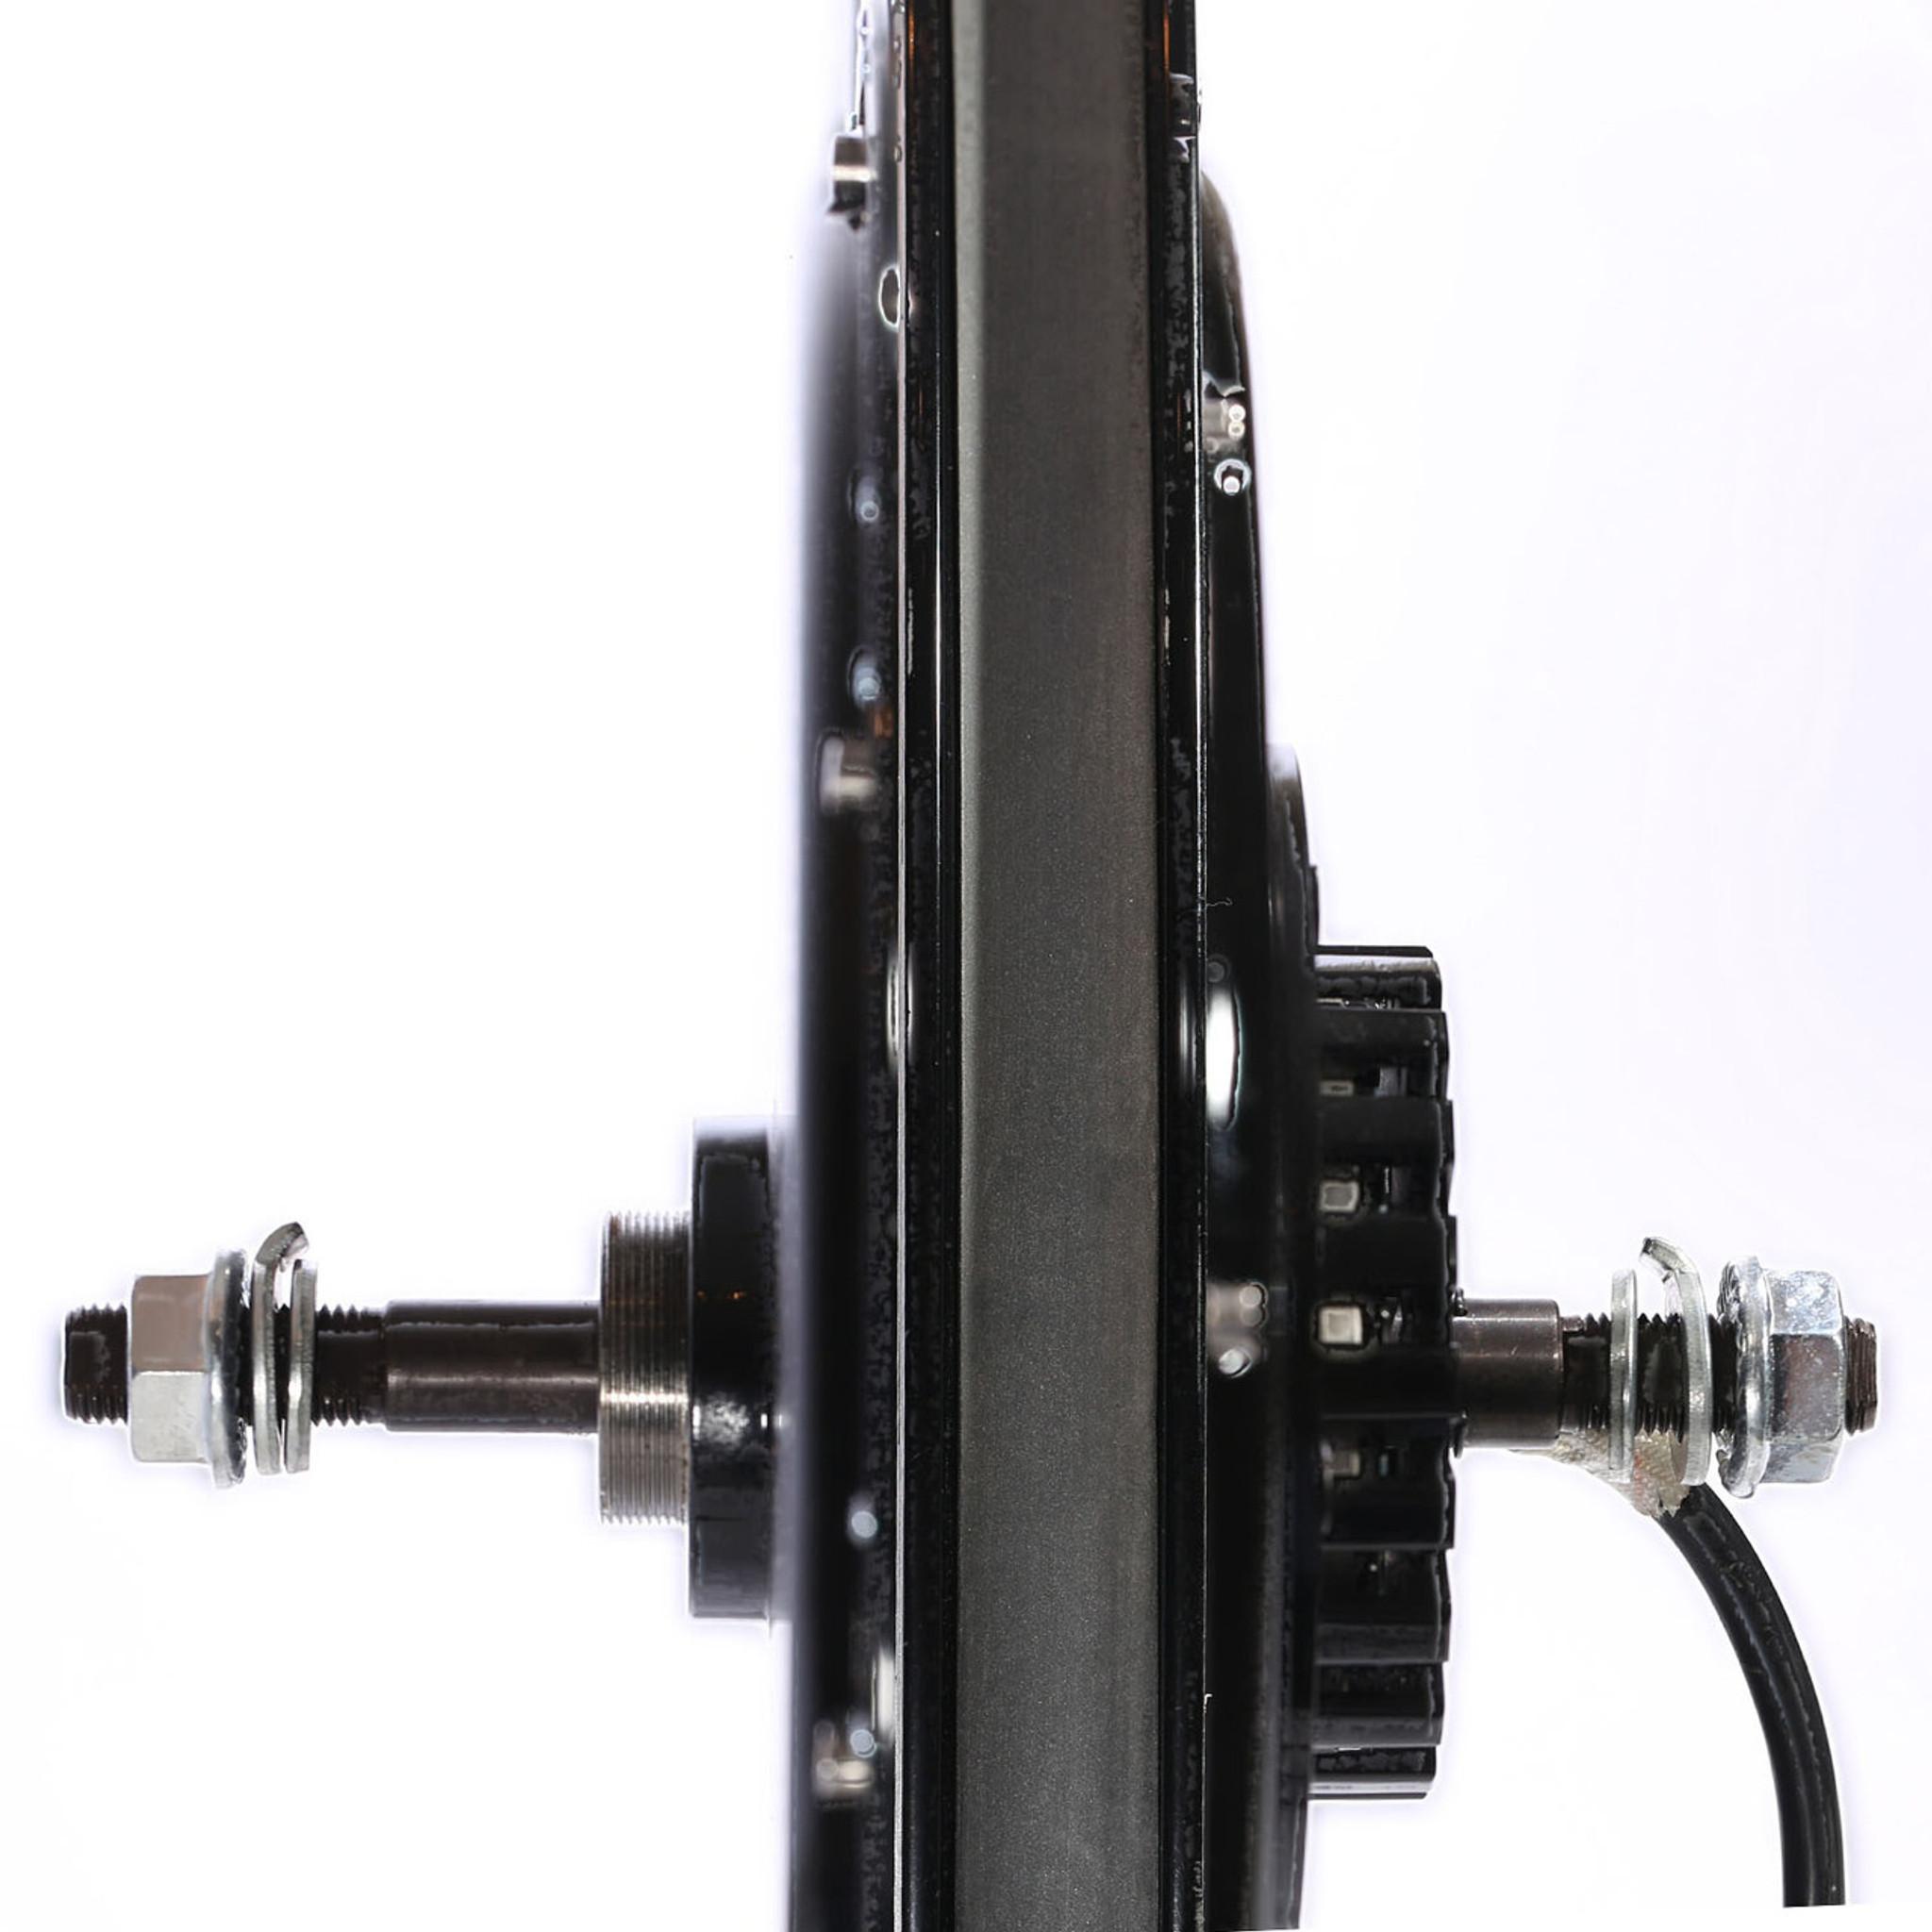 Golden pie v5 golden motor hub kit luna cycle golden pie v5 golden motor hub kit solutioingenieria Gallery